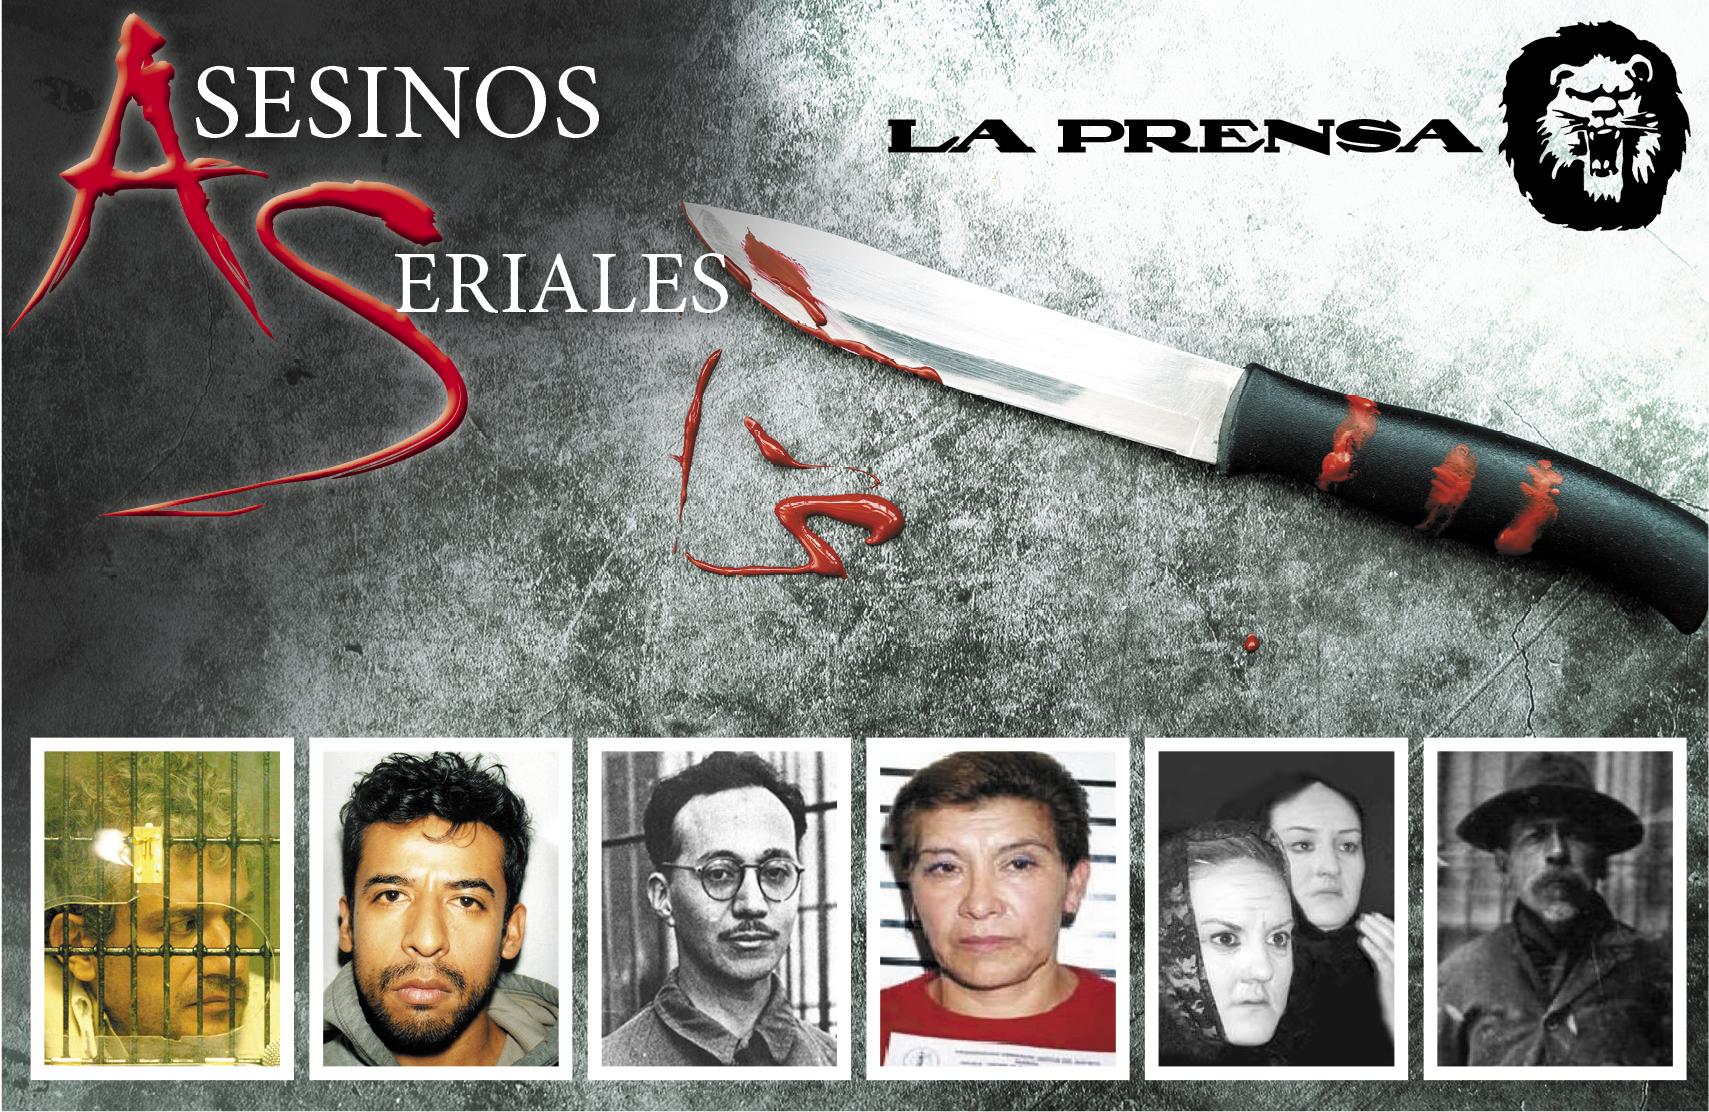 Los asesinos que sembraron terror en México